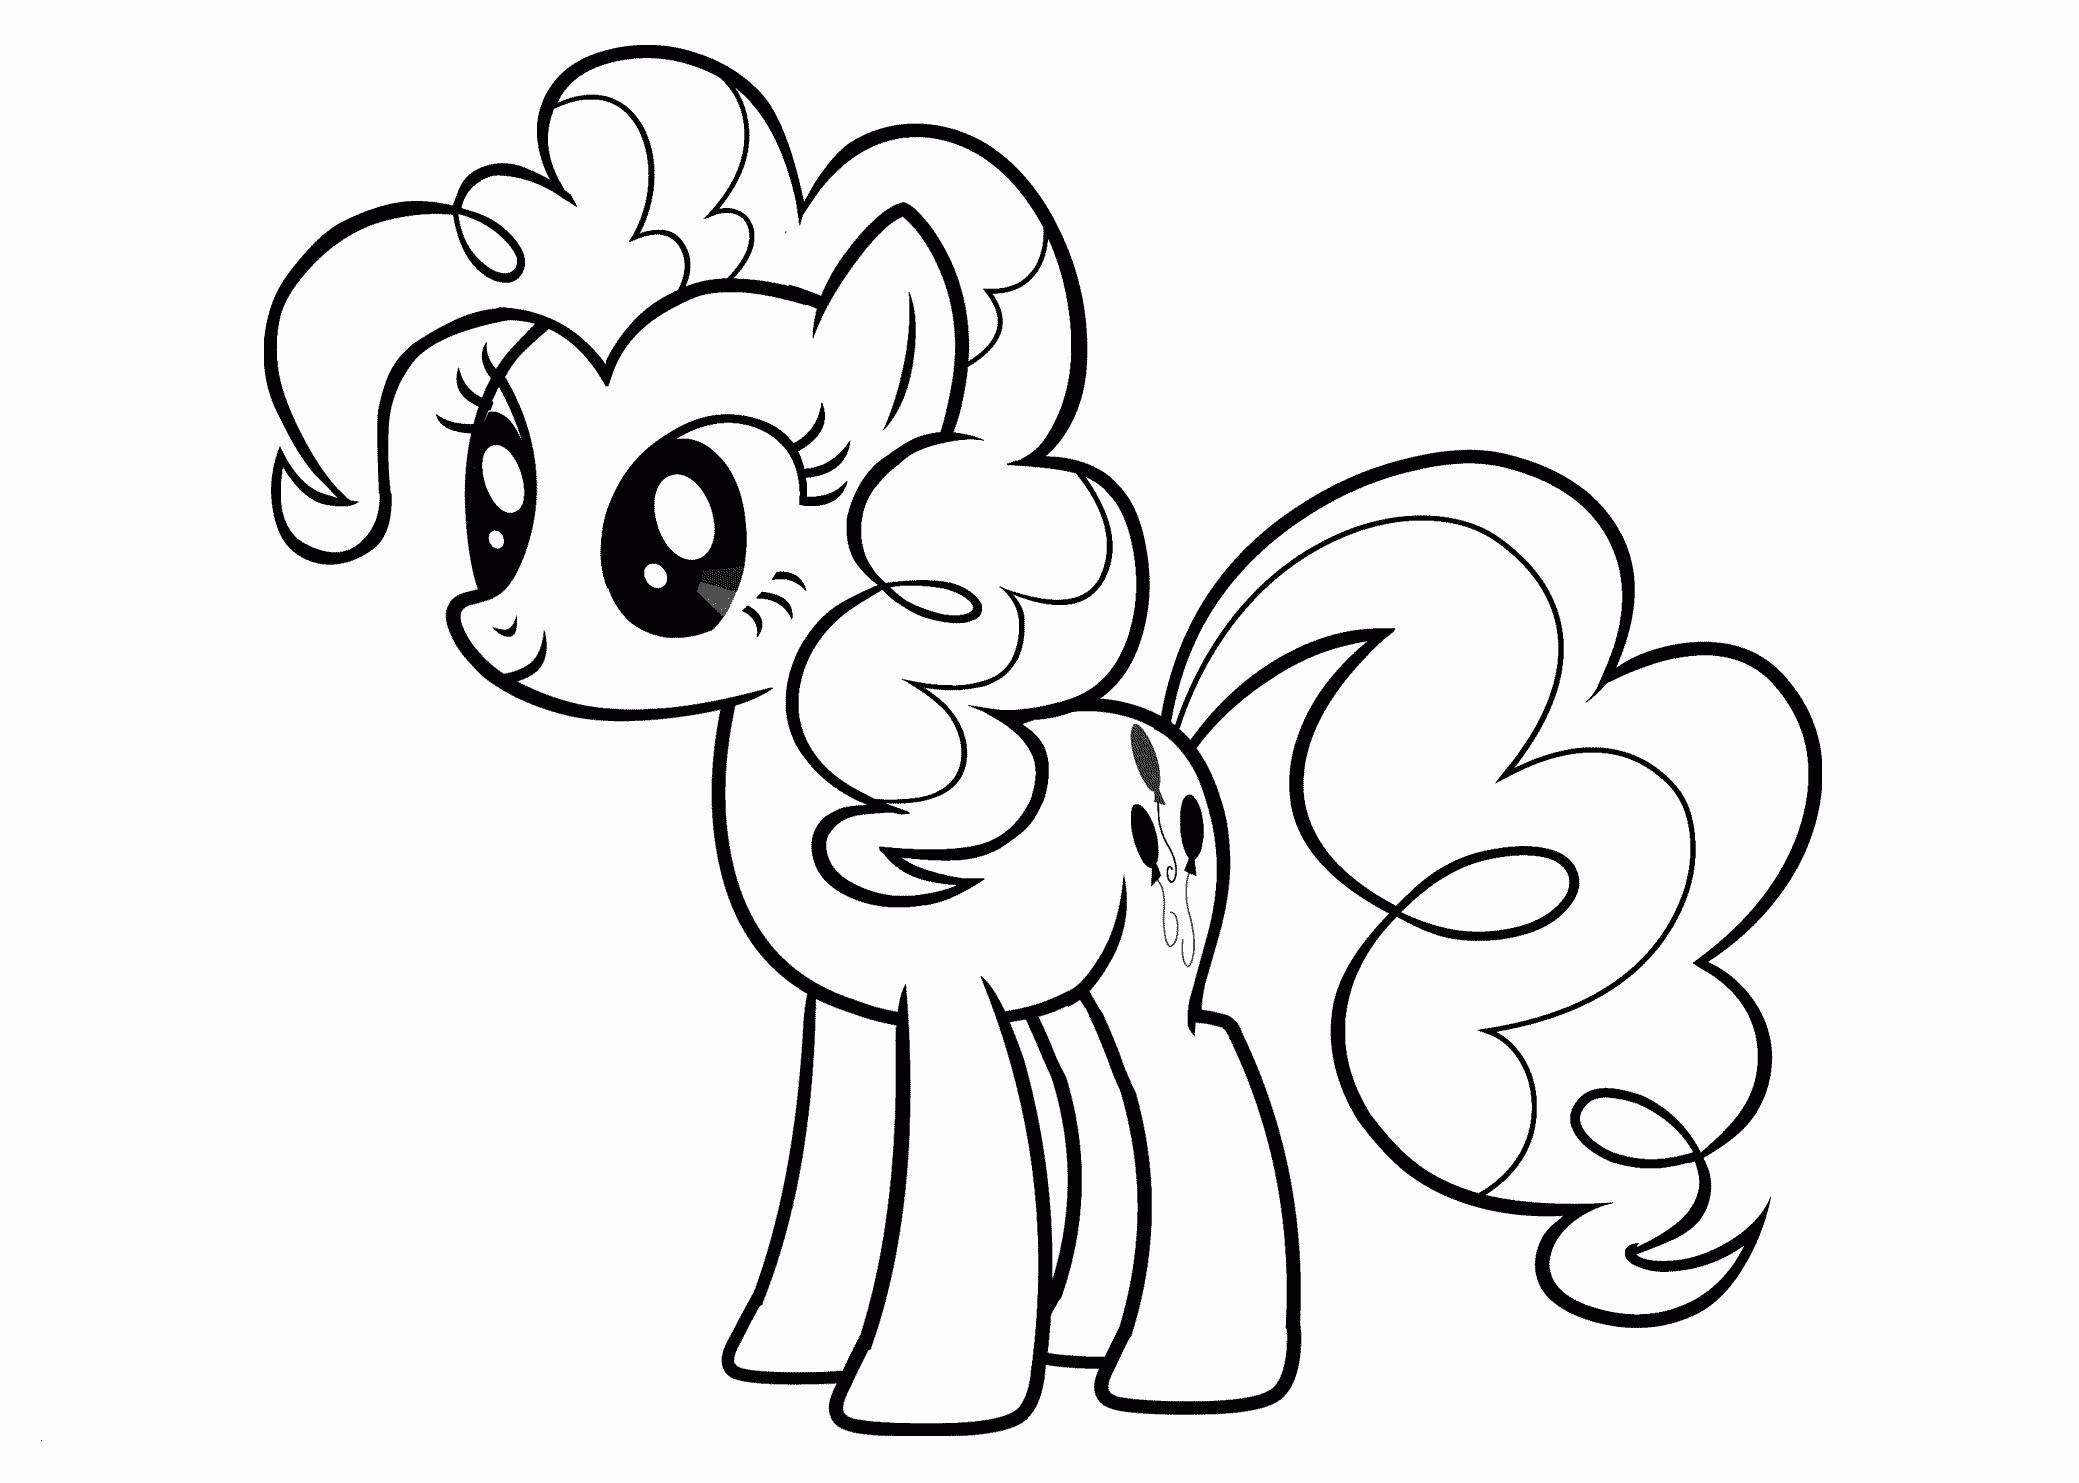 Ausmalbild My Little Pony Genial My Little Pony Ausmalen Luxus Ausmalbilder My Little Pony 02 Crafts Stock